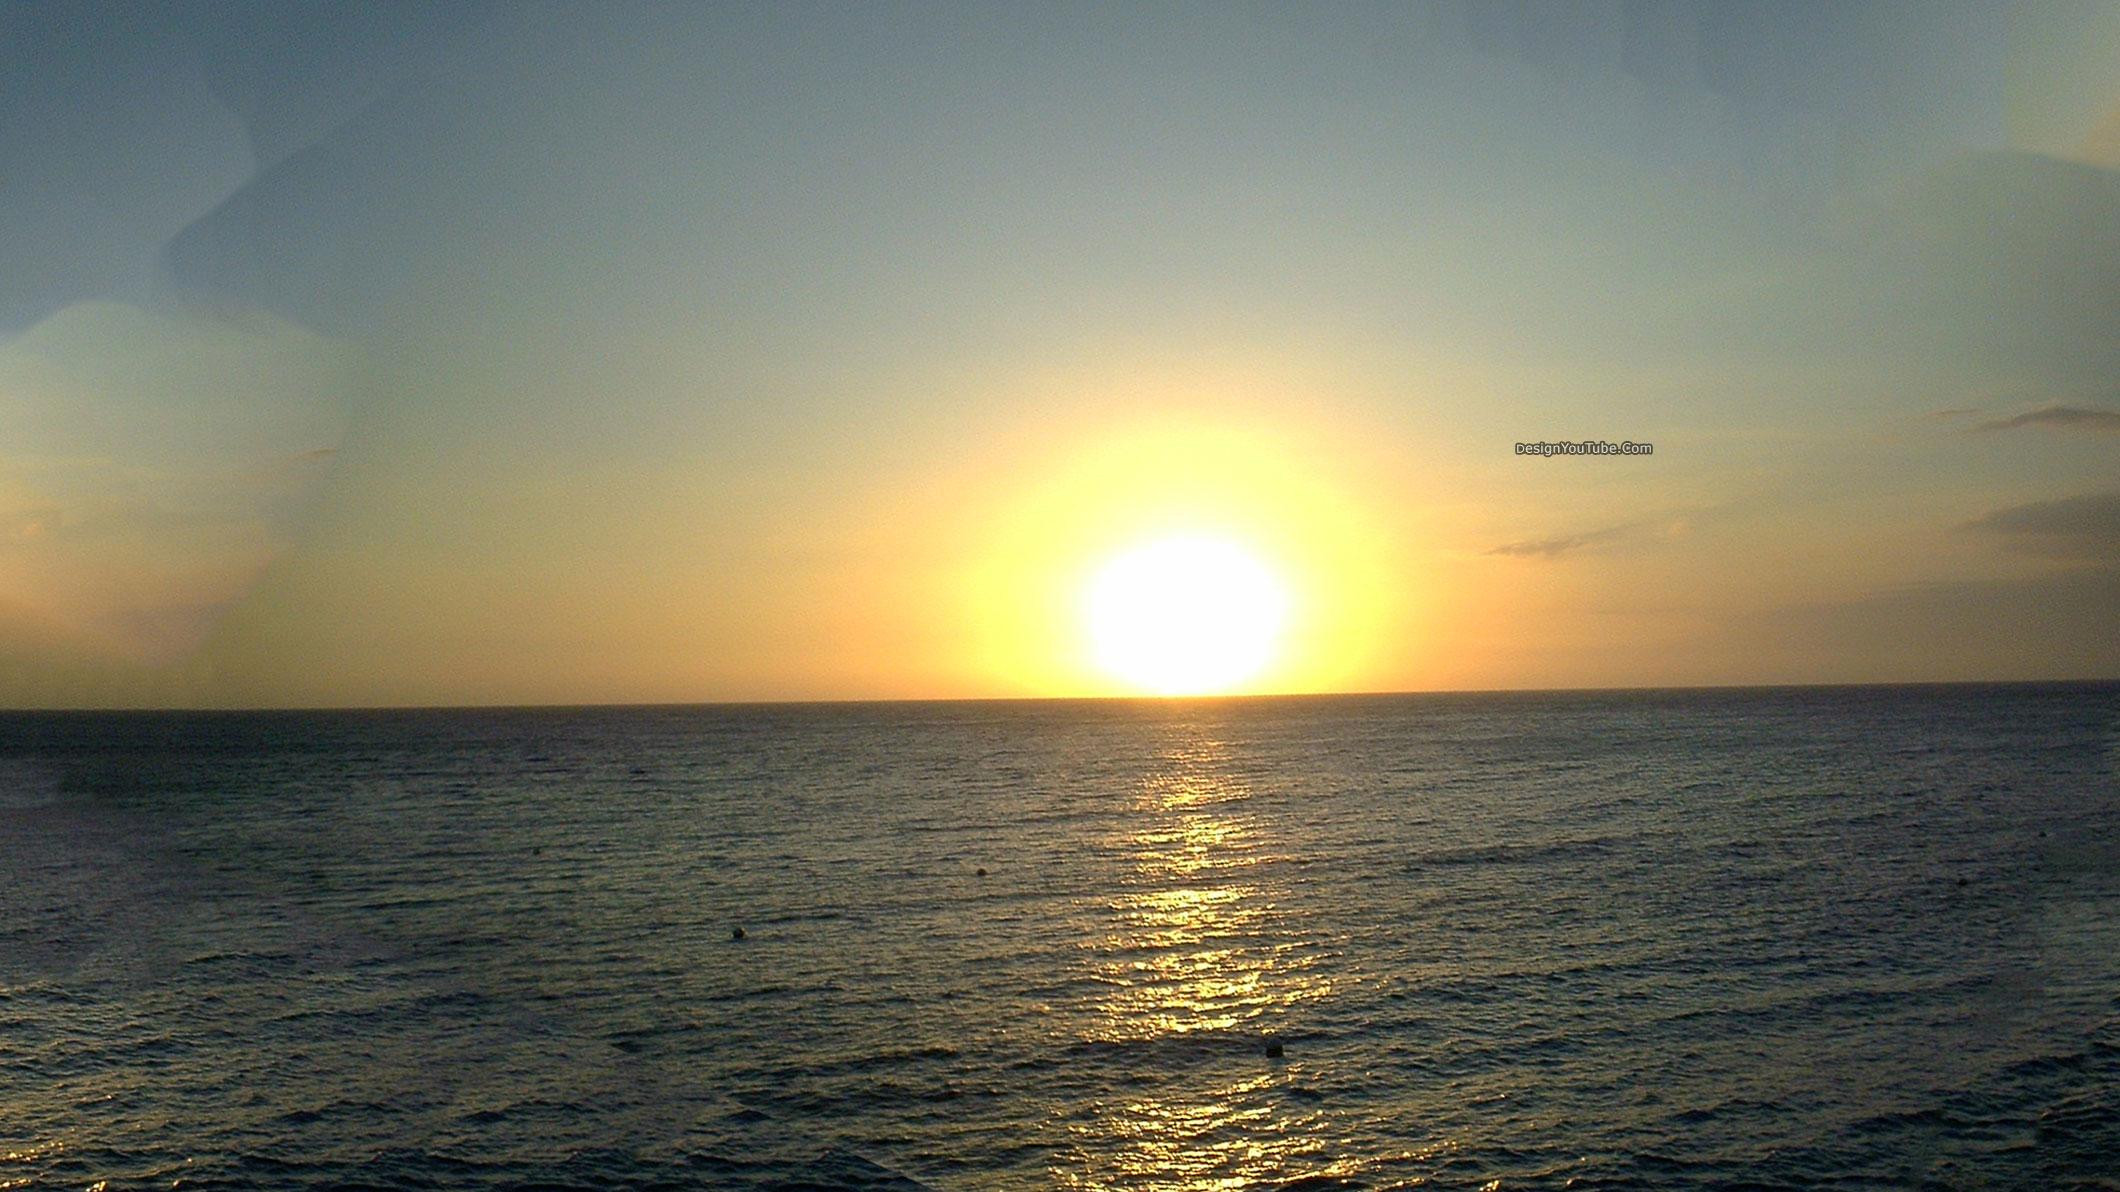 Sunset Youtube Channel Art